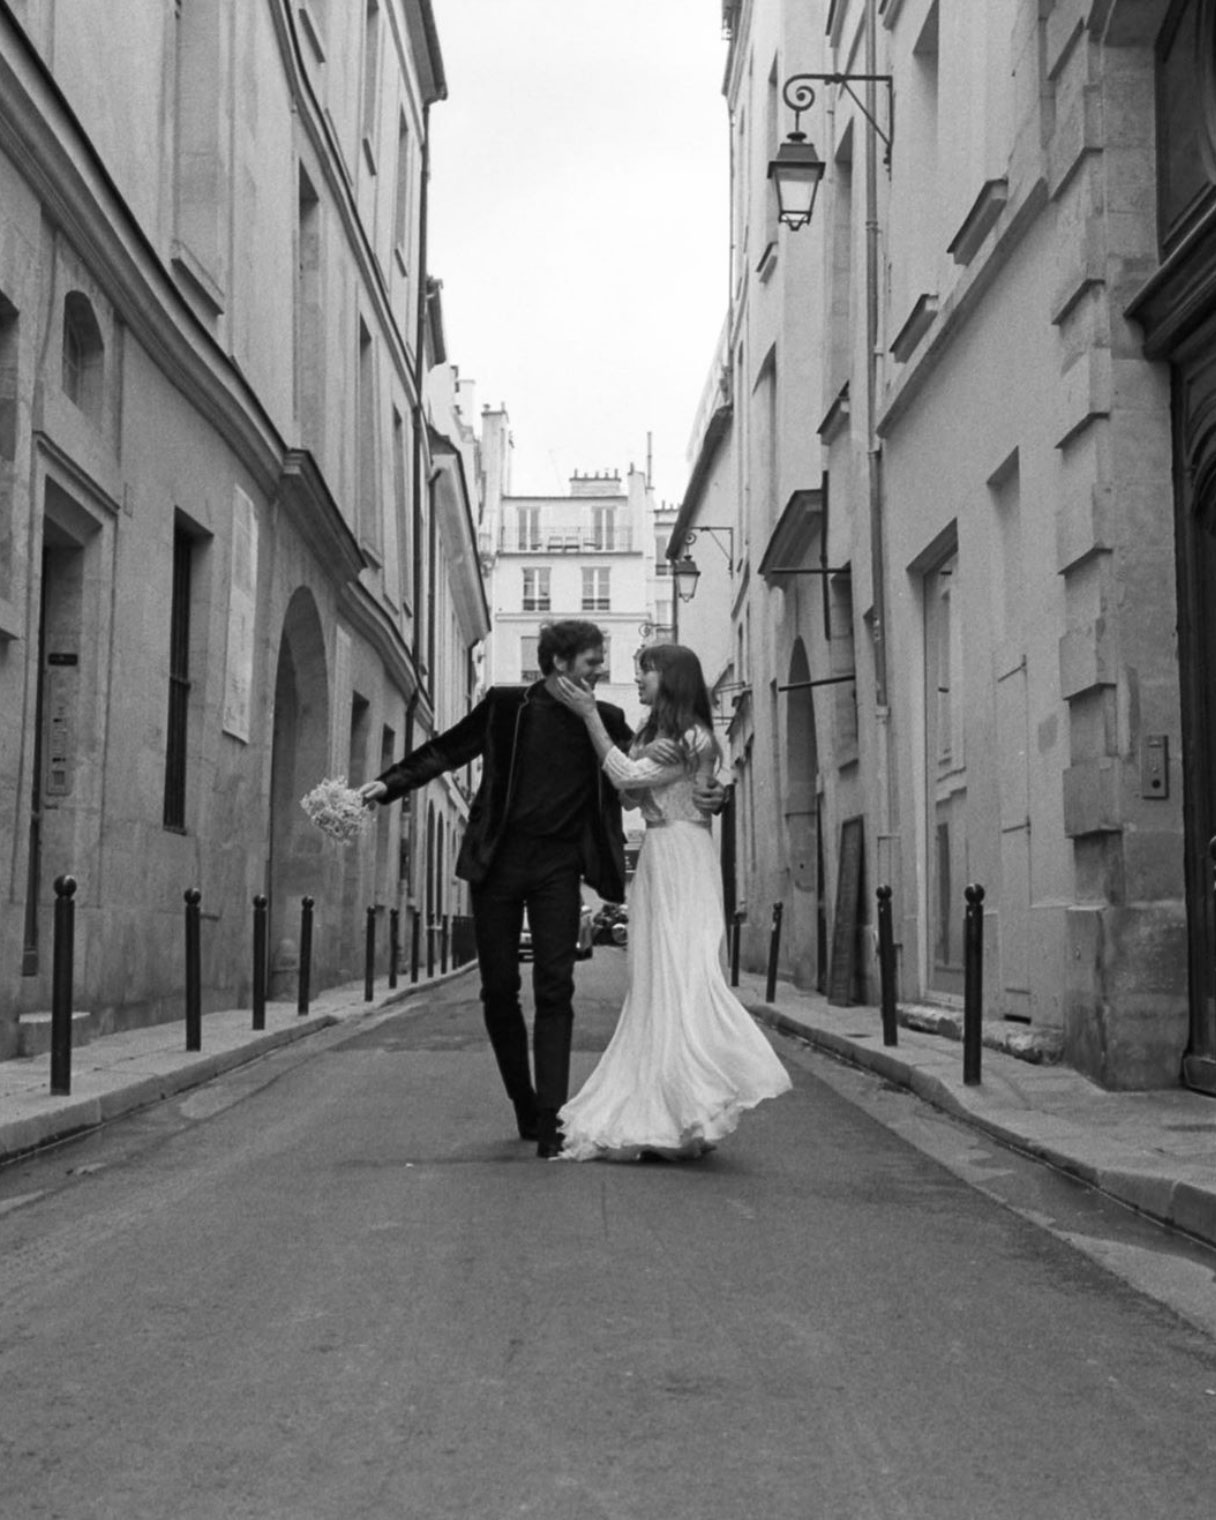 Phil-Chester-Sara-Byrne-Paris-Elopement-07.jpg